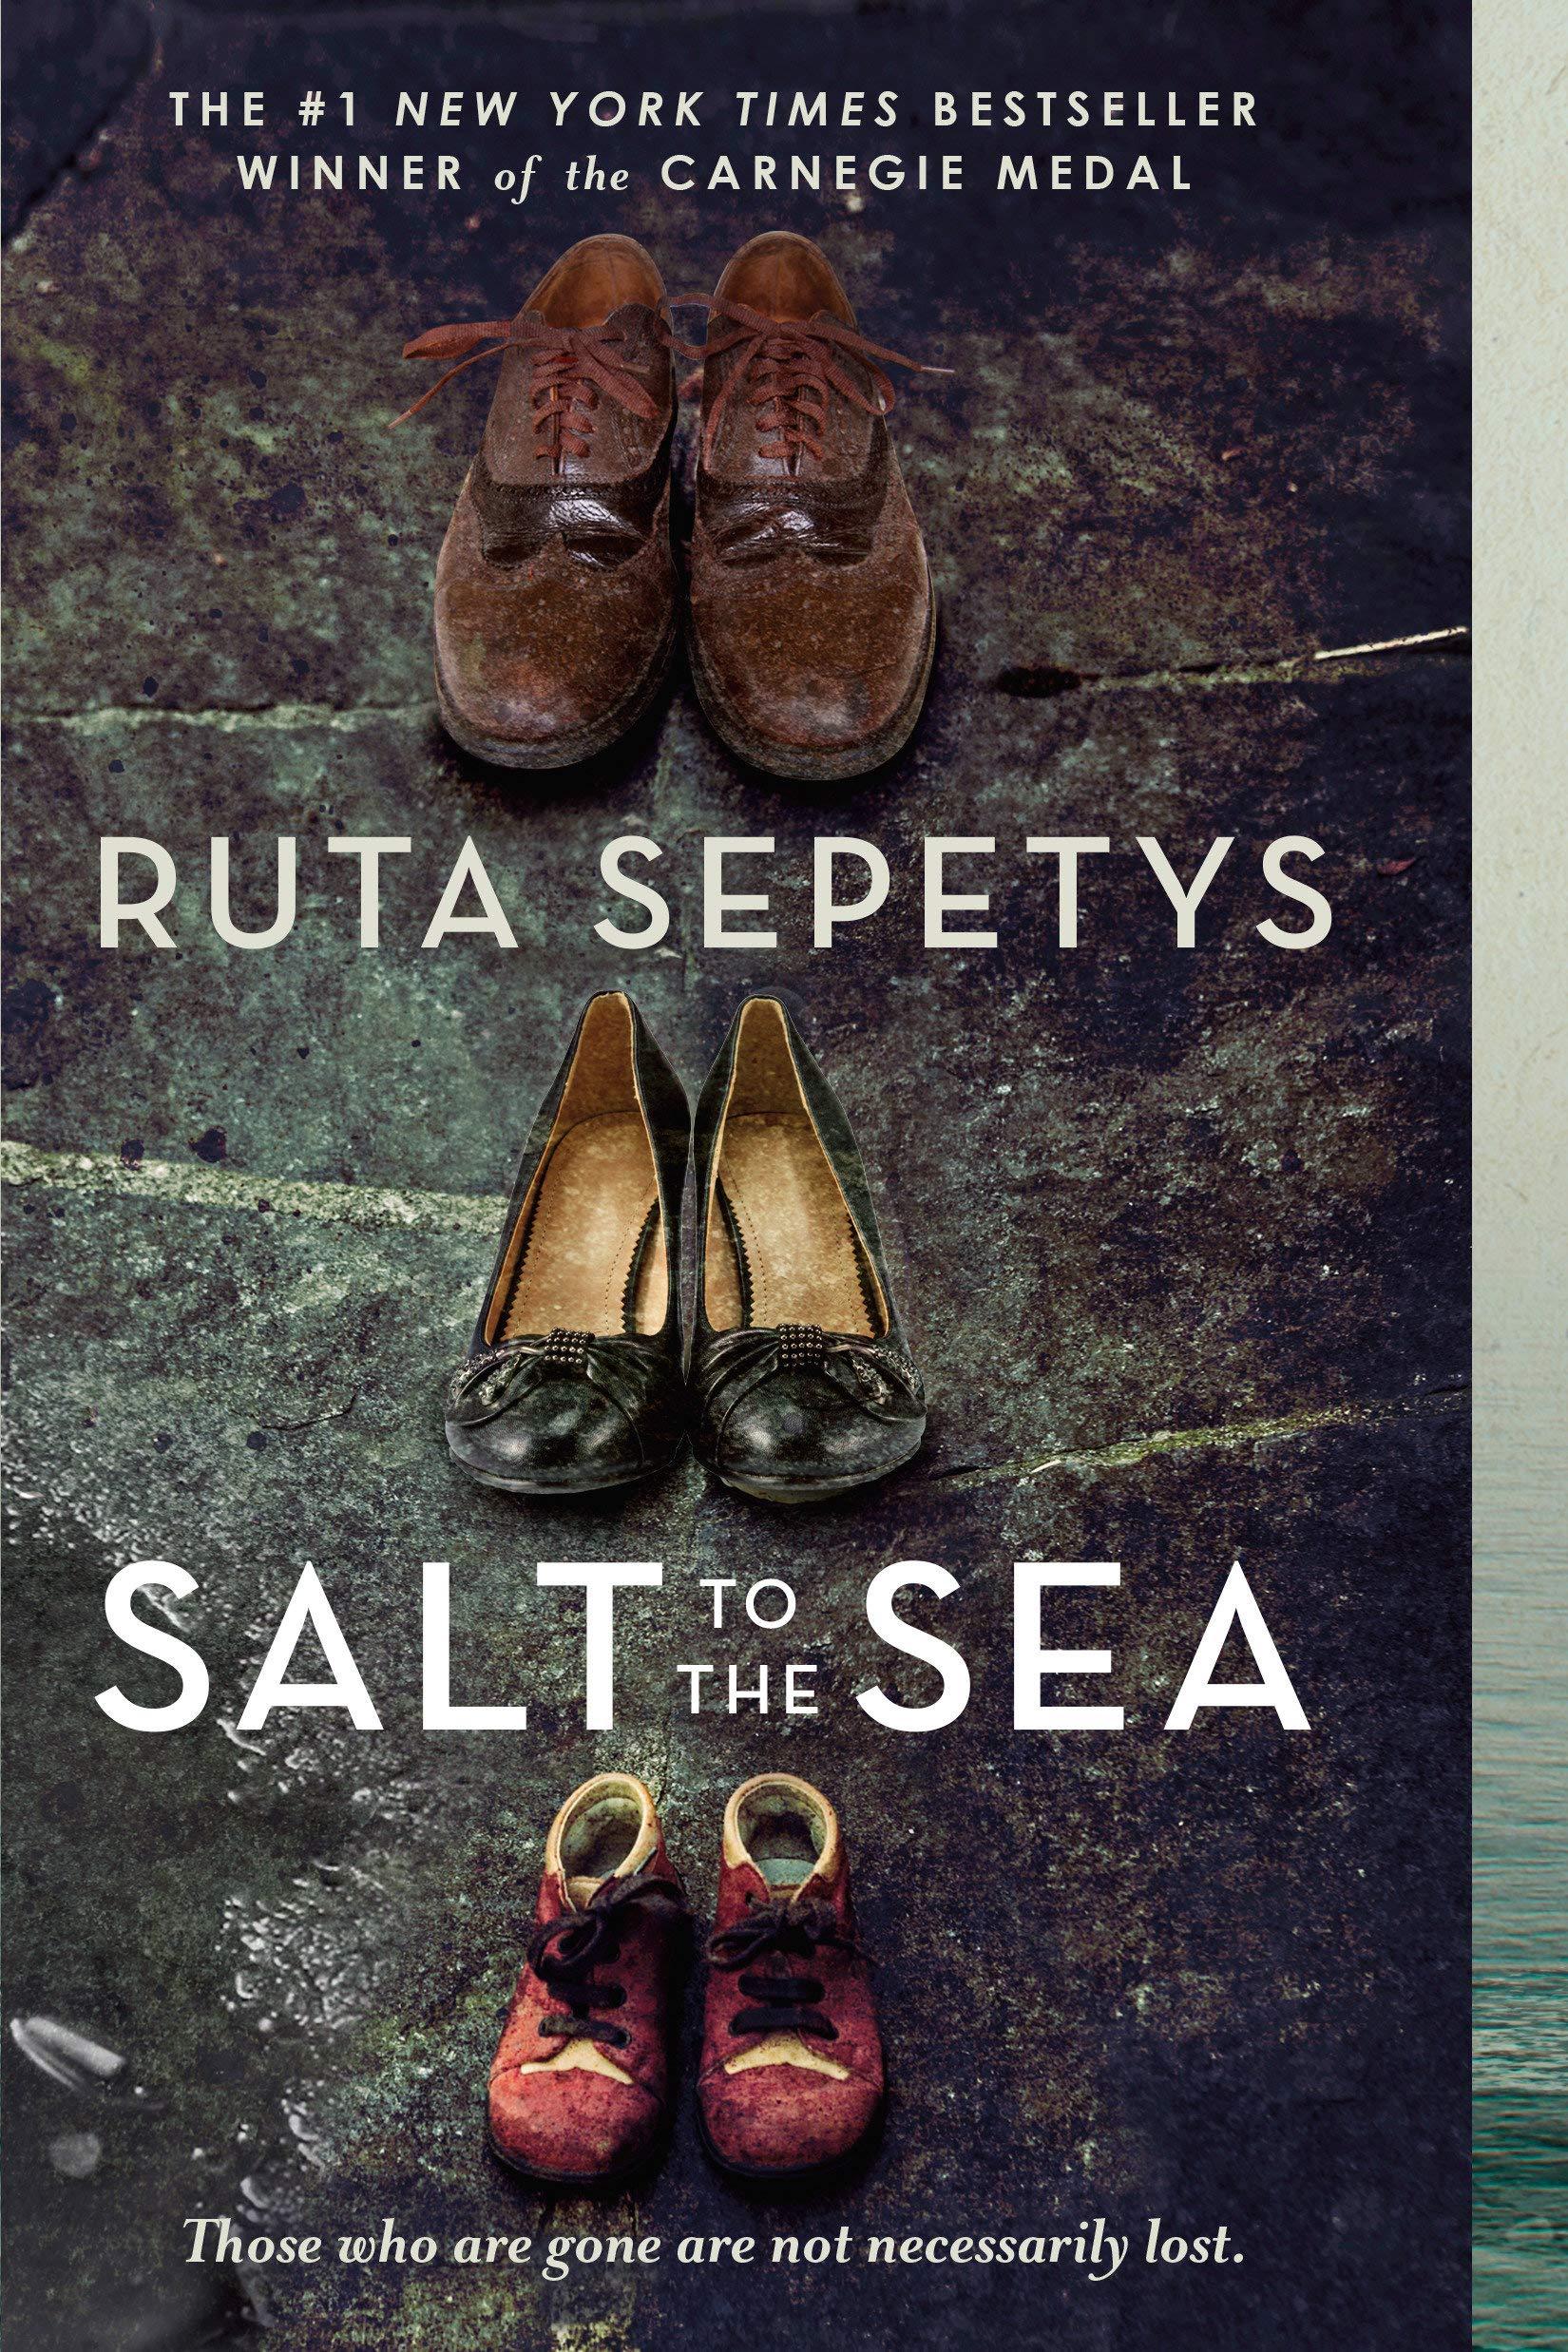 Amazon.com: Salt to the Sea (9780142423622): Sepetys, Ruta: Books